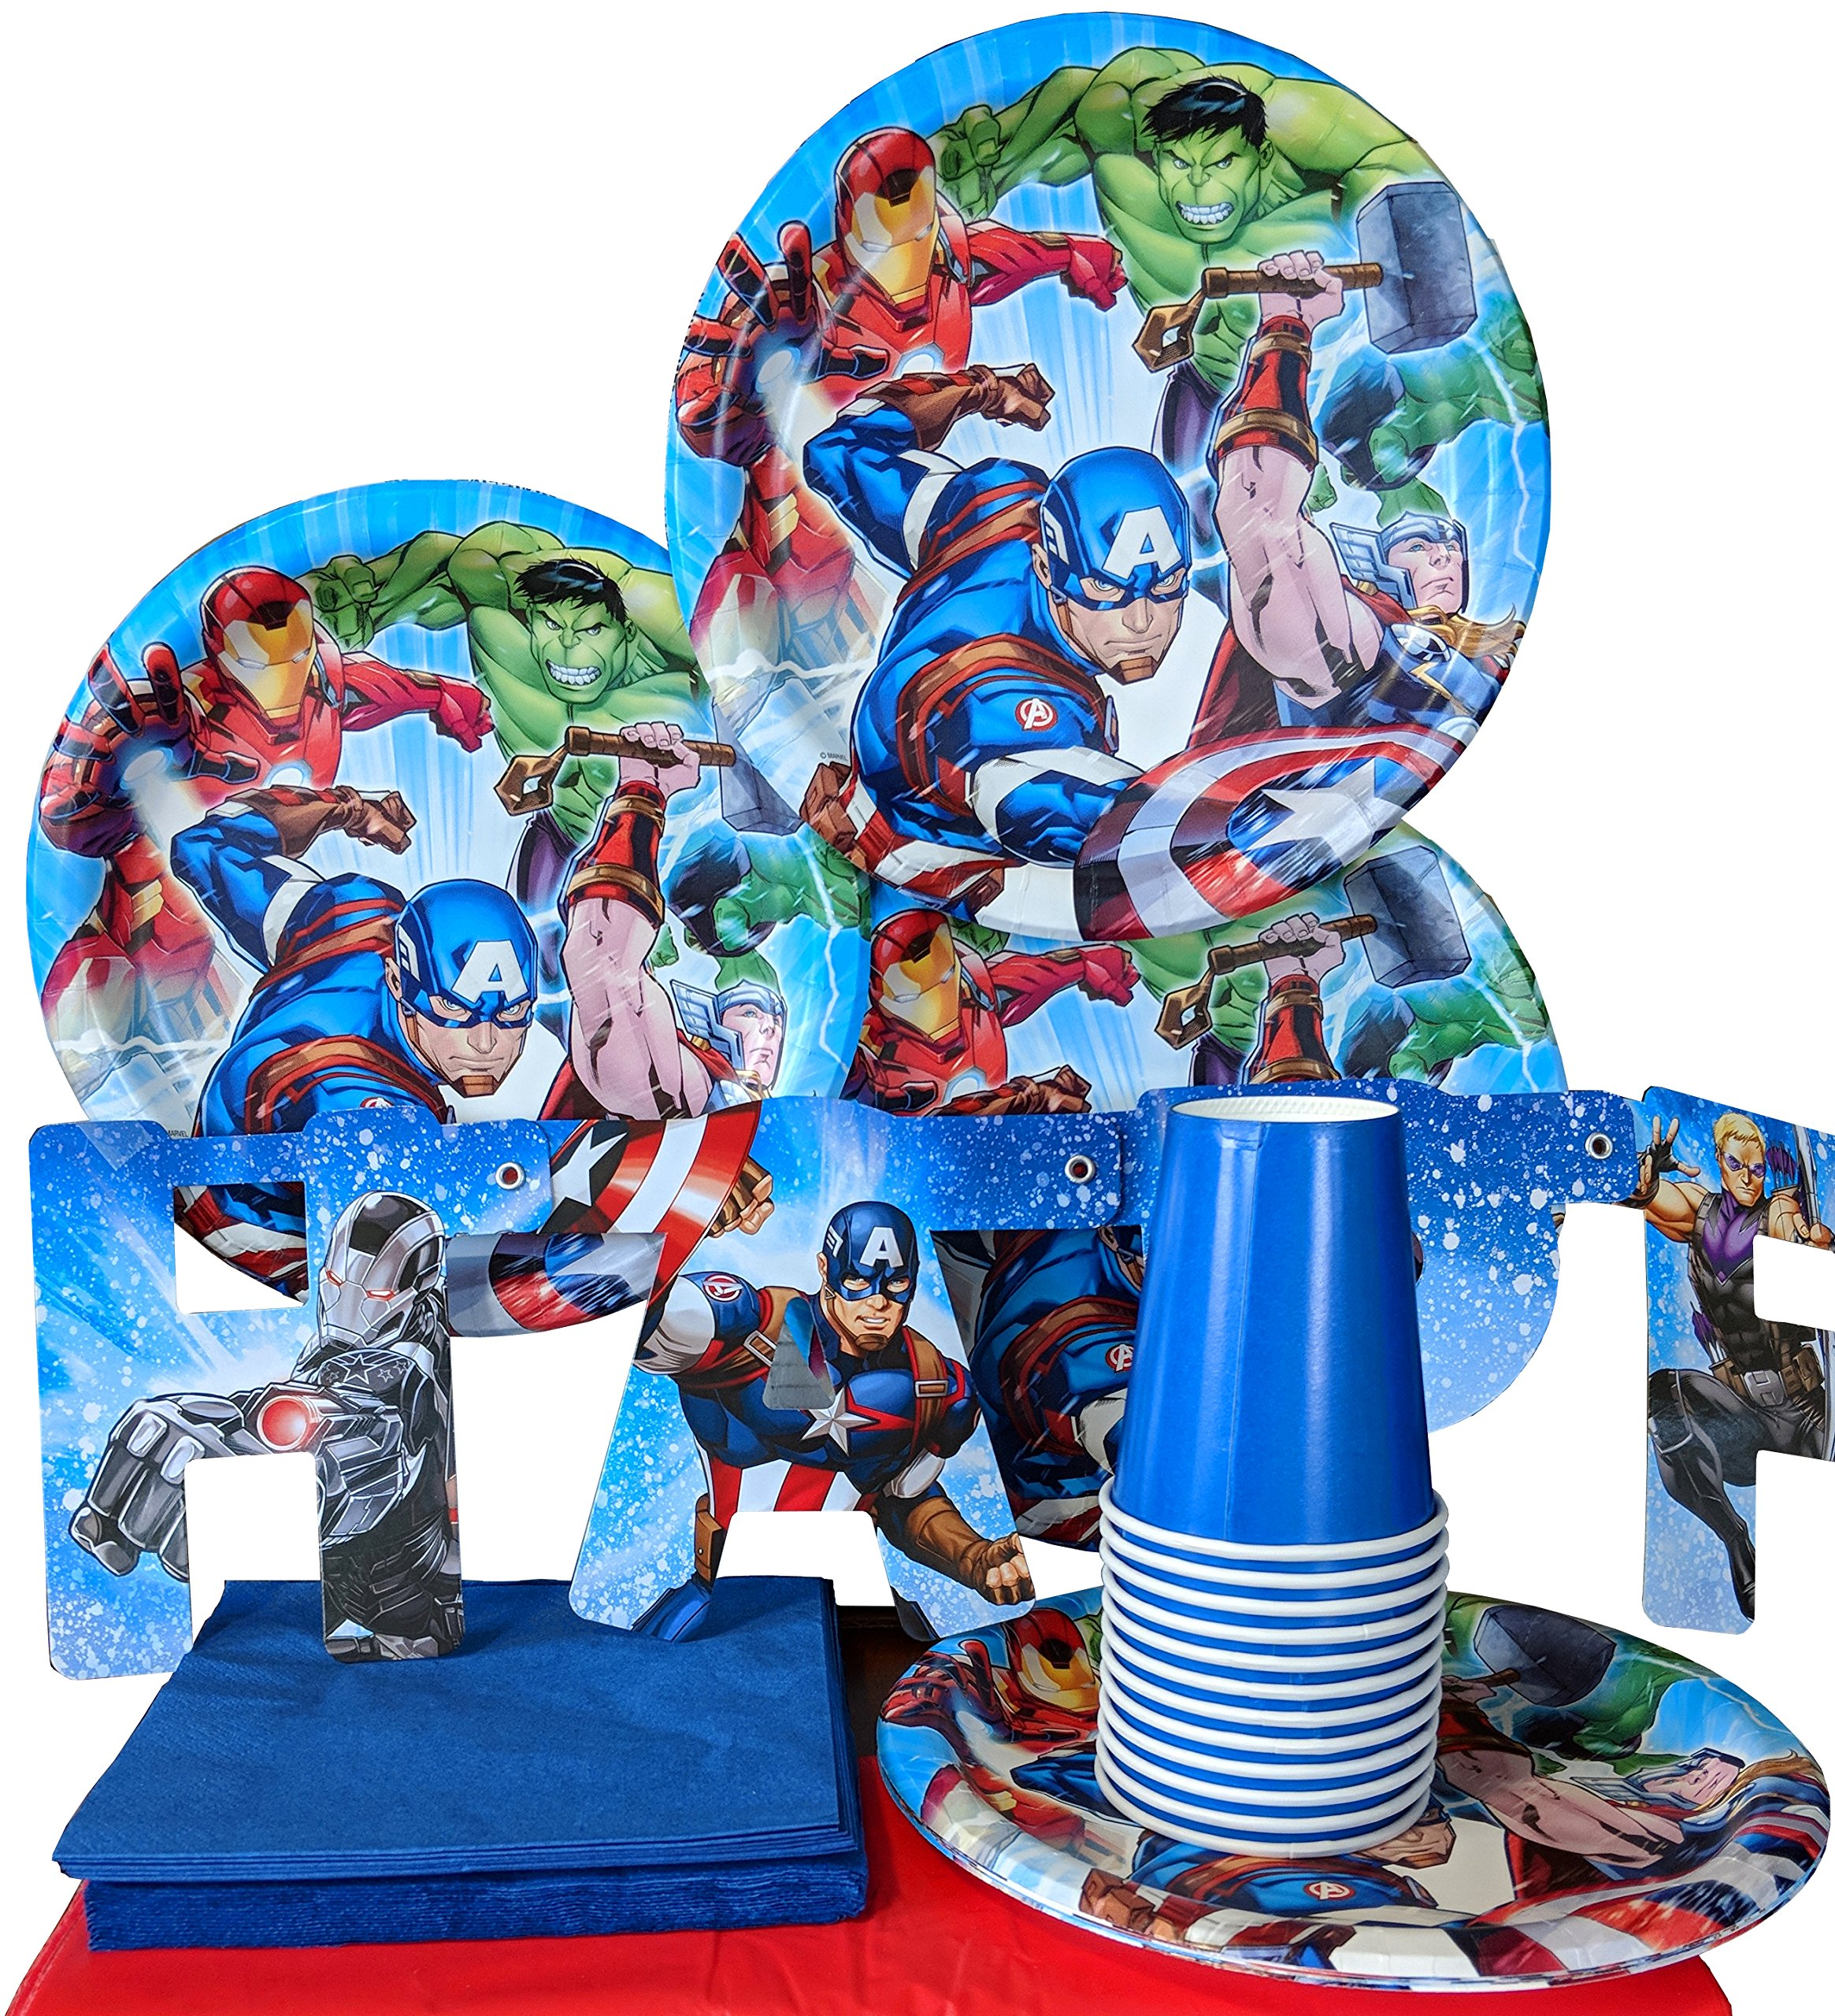 Marvel Avengers Superhero Birthday Plates Napkins Cups Party Supplies Serves 8